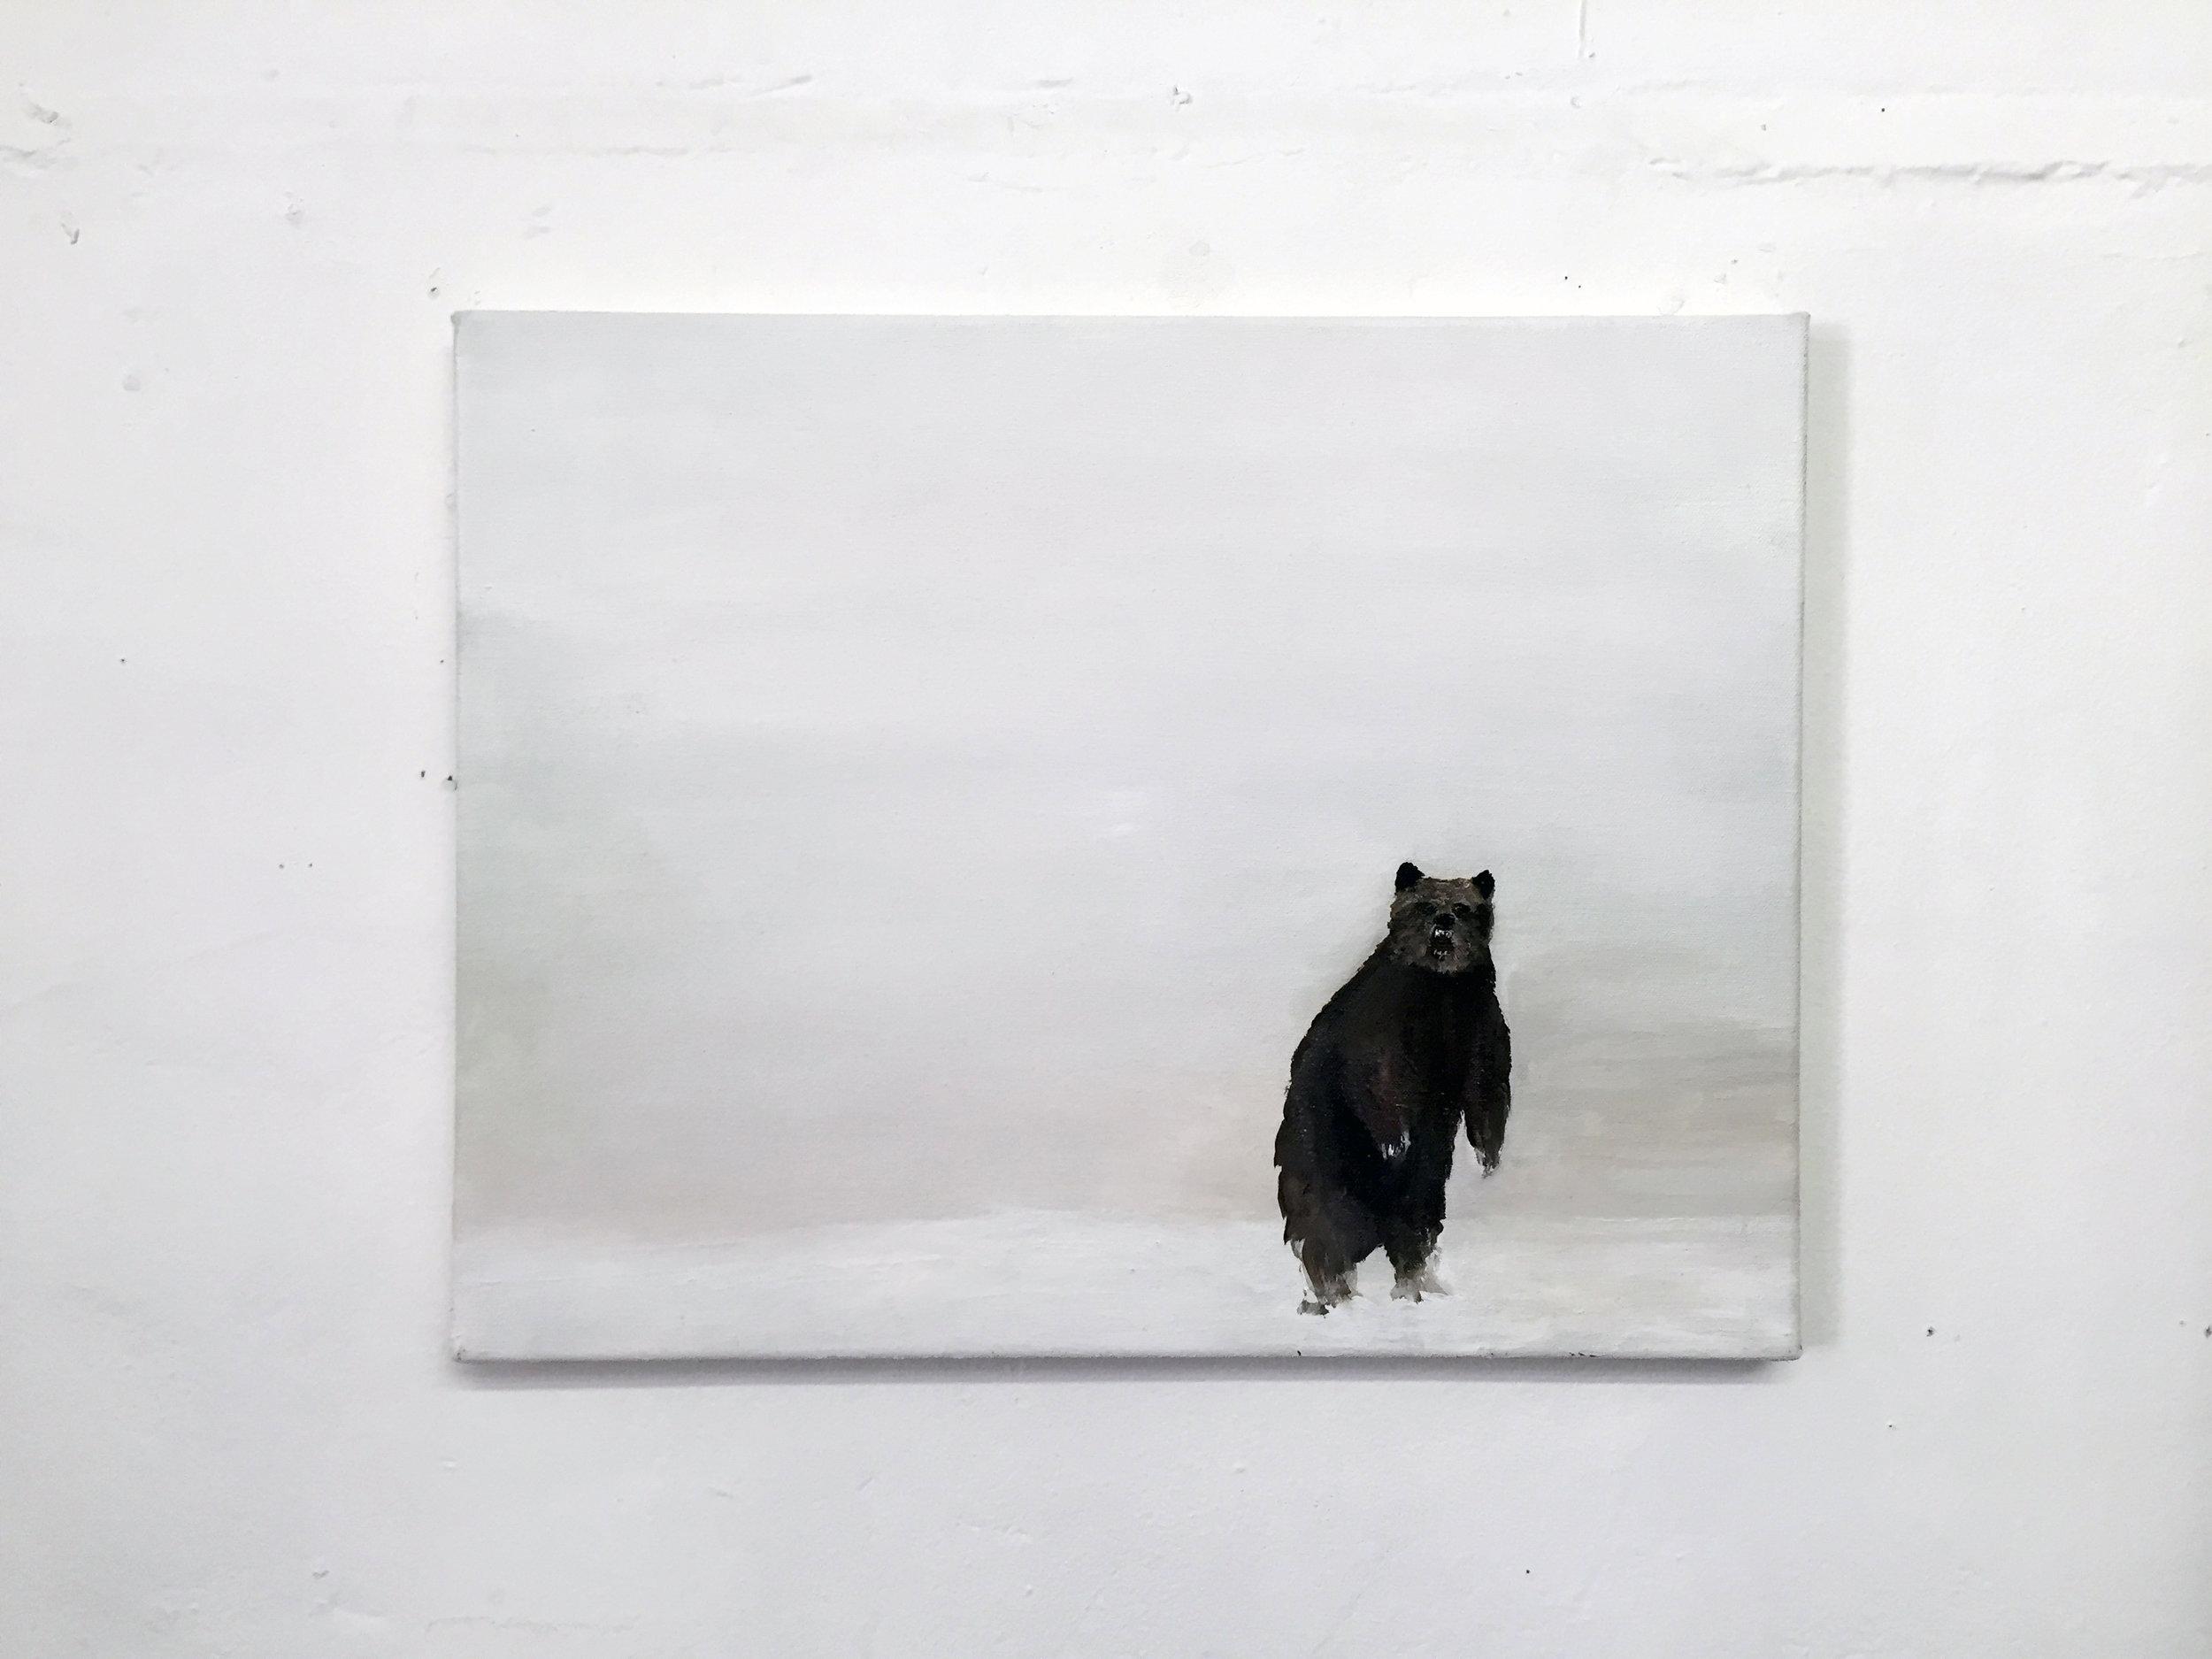 bear-wall.JPG